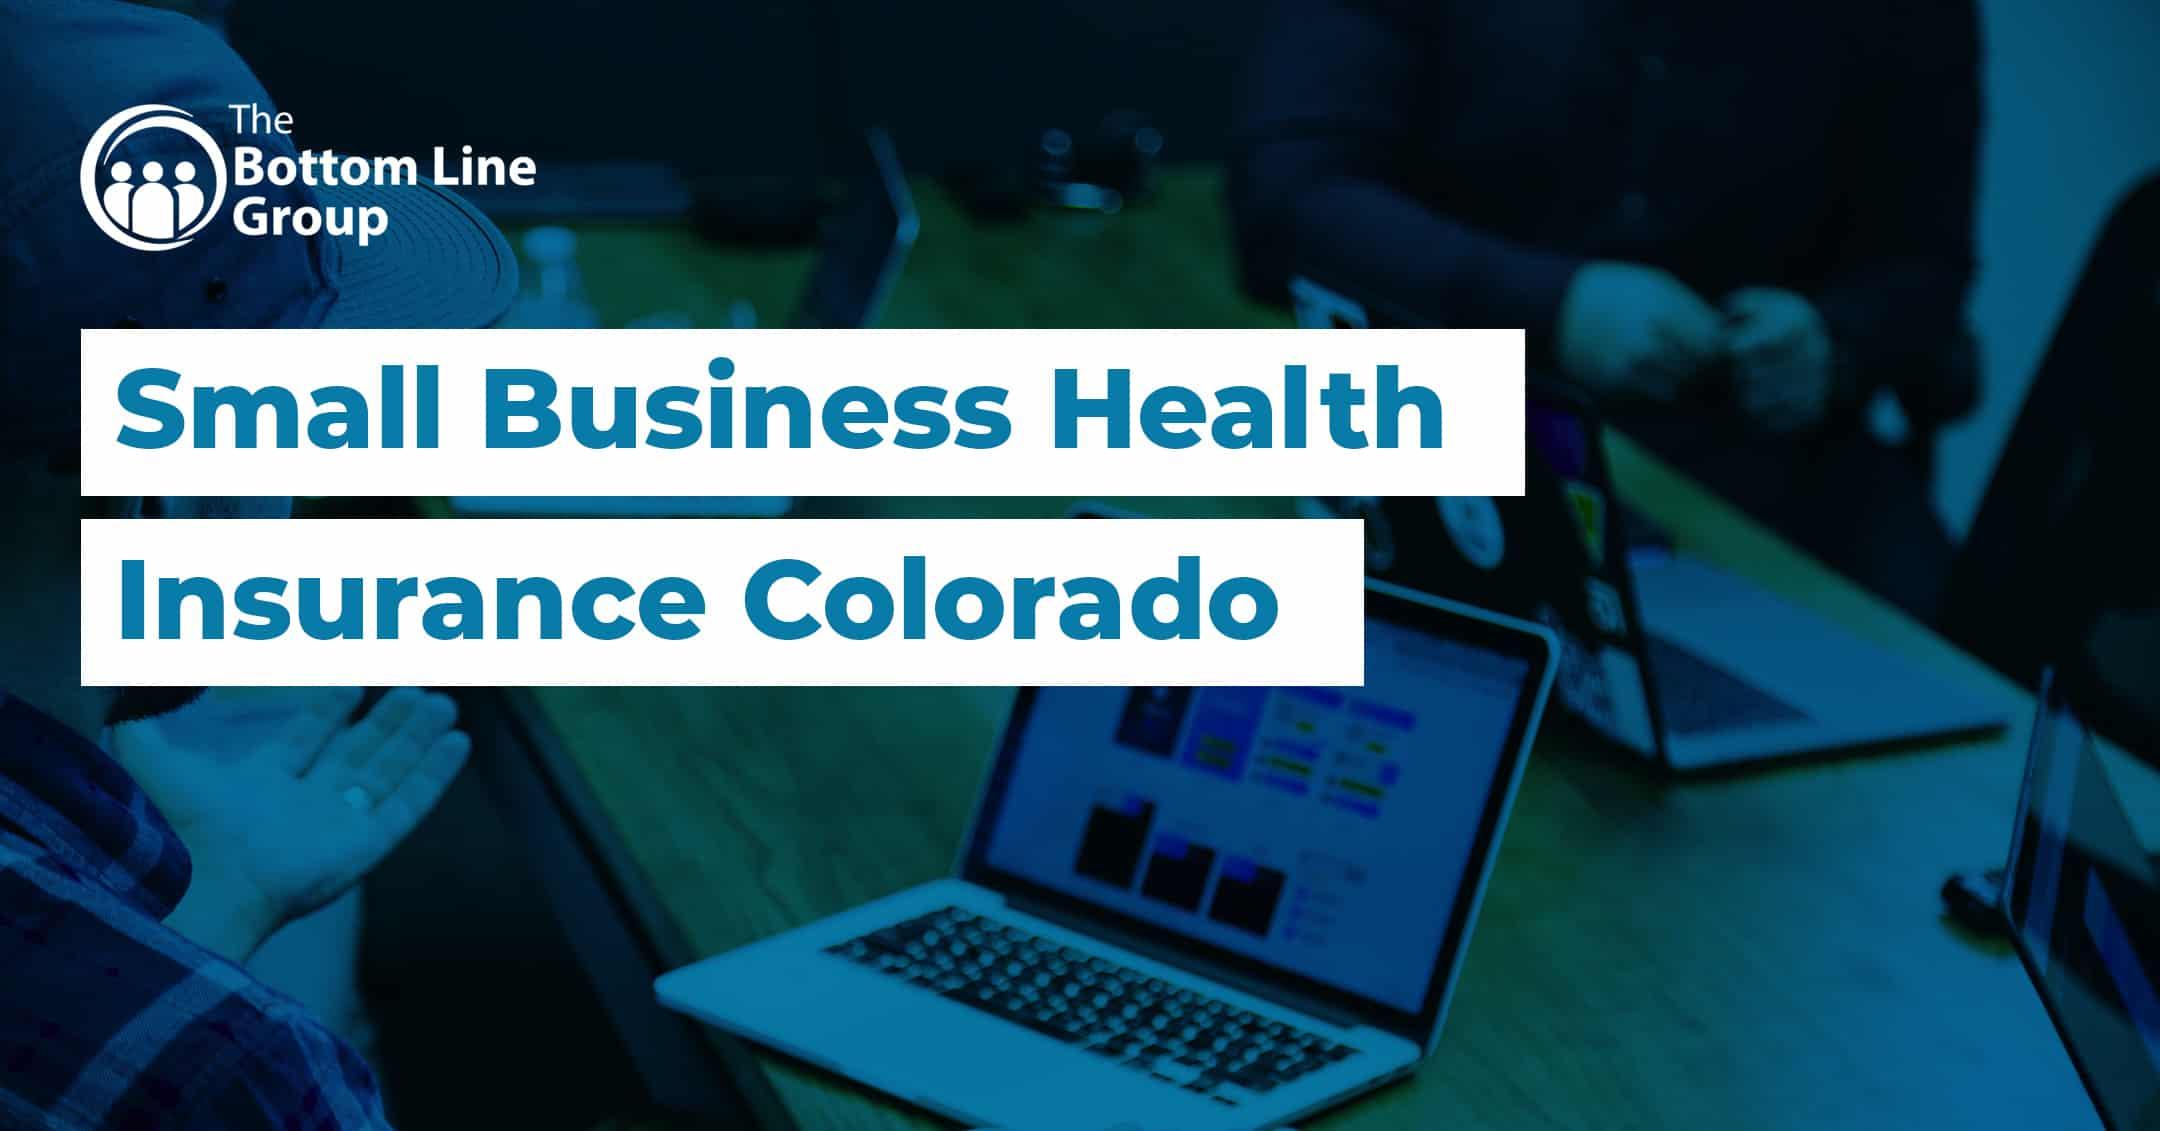 51-(Small-Business-Health-Insurance-Colorado)1